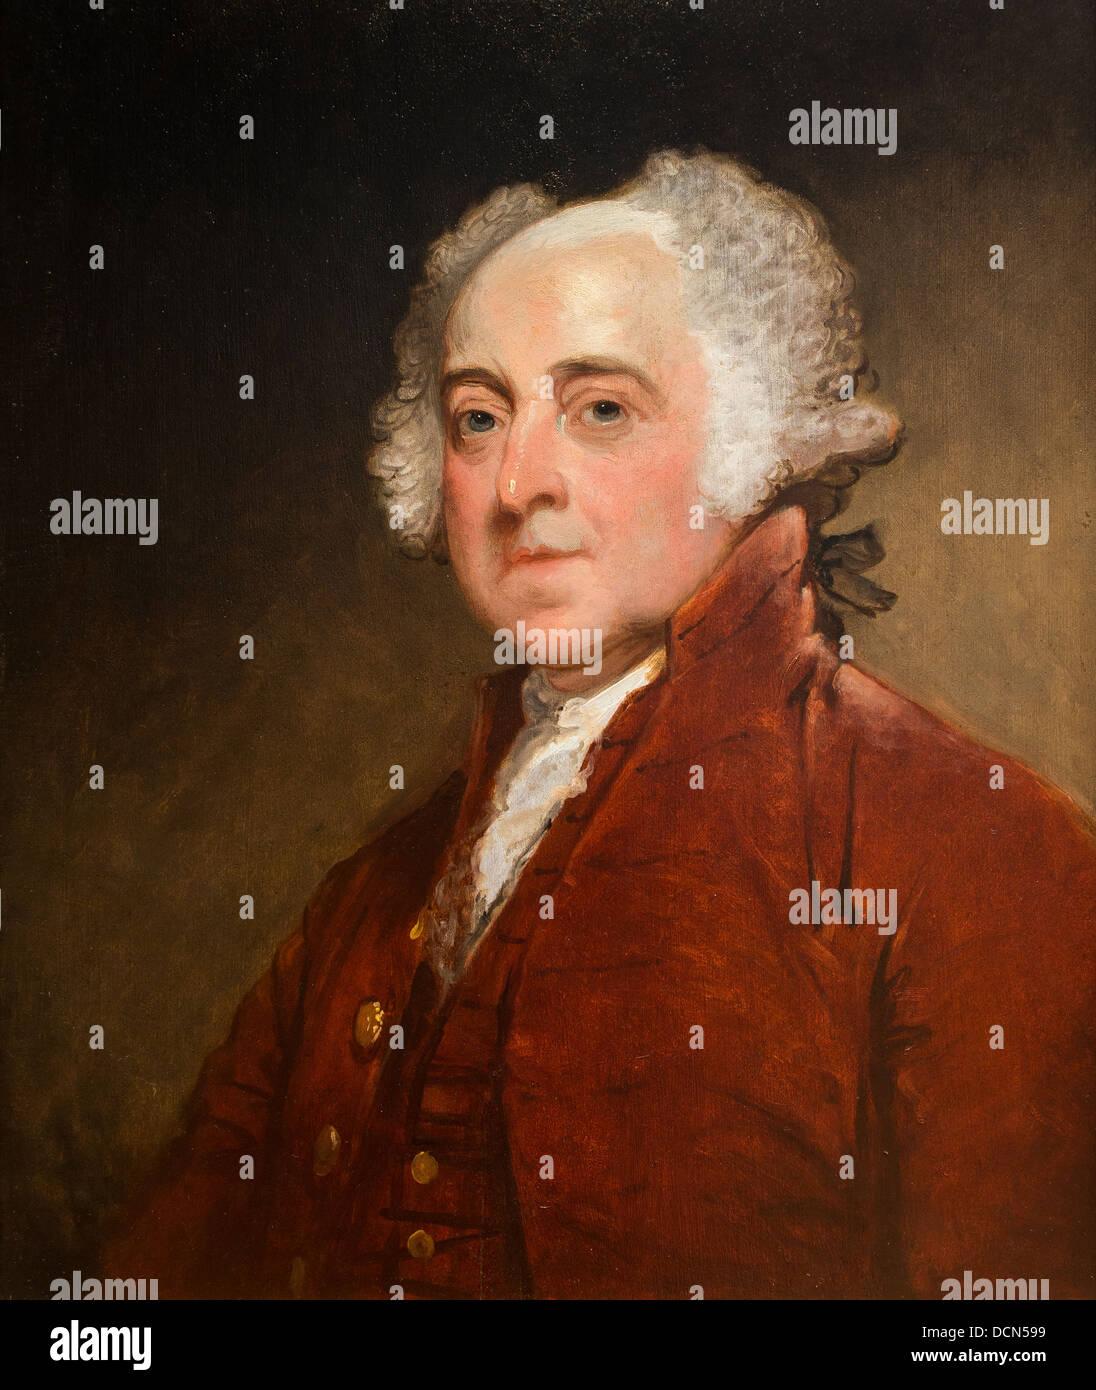 El siglo xix - John Adams - Gilbert Stuart (1821) Philippe Sauvan-Magnet / Museo Activo Imagen De Stock